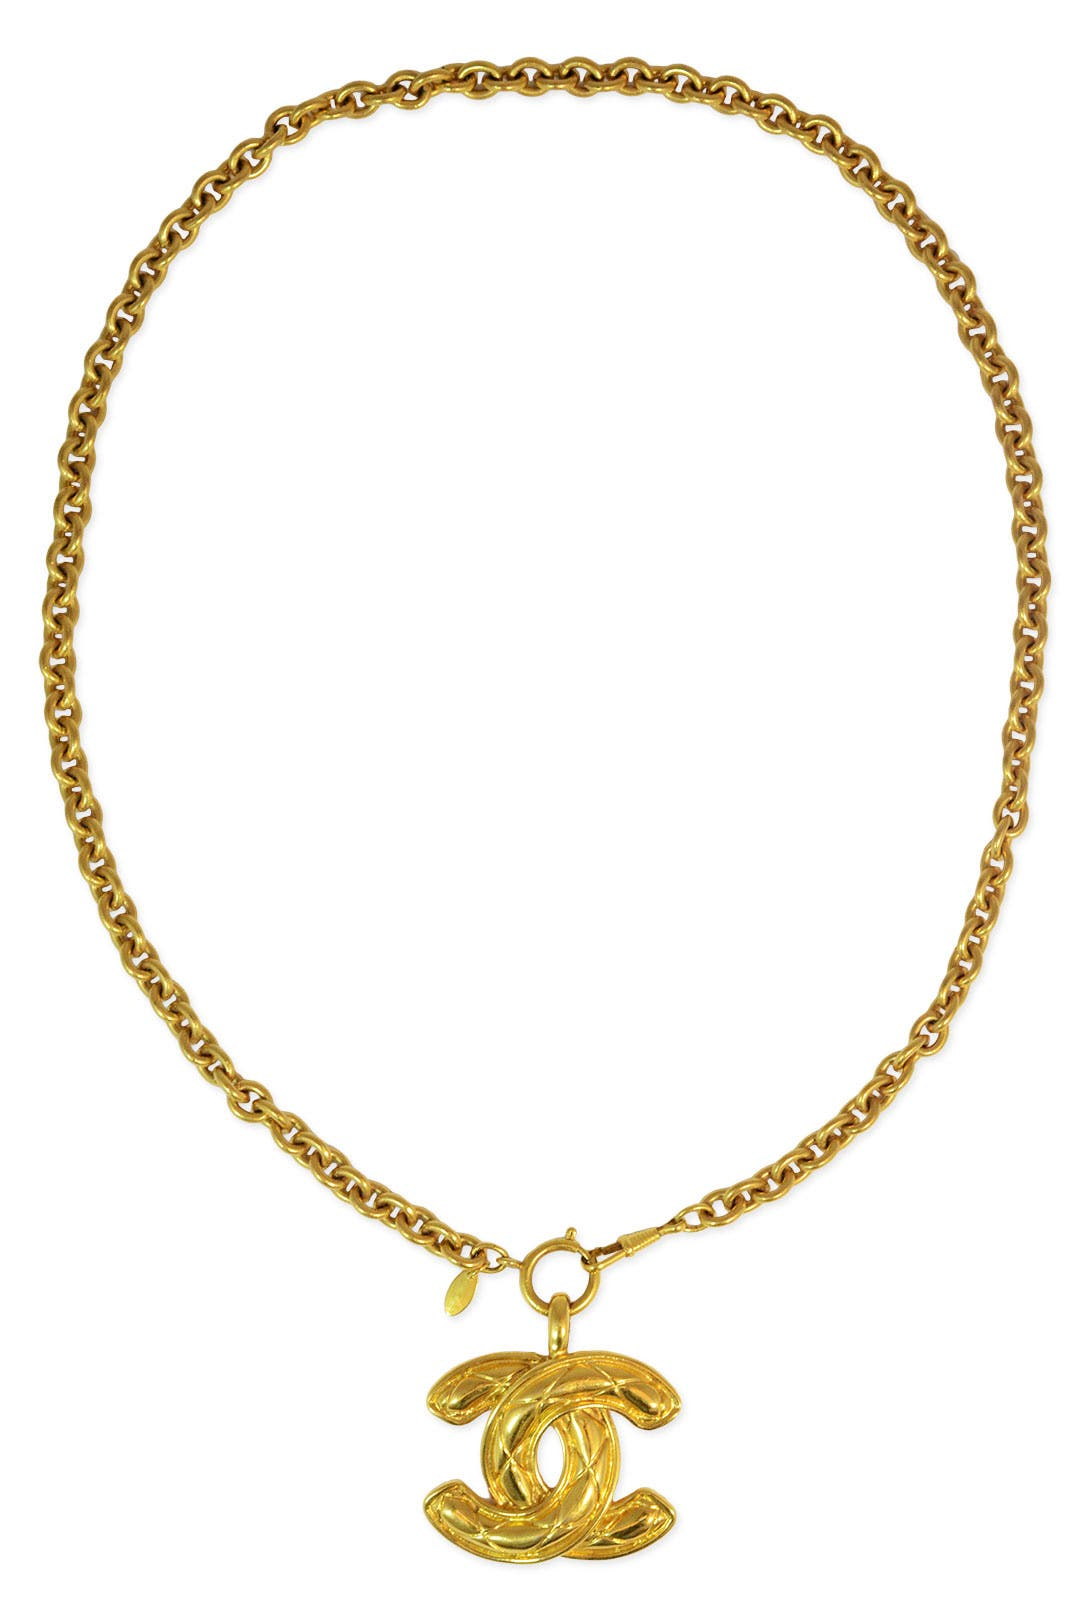 02116fcc049e Vintage Chanel CC Pendant Necklace by WGACA Vintage for $200   Rent the  Runway